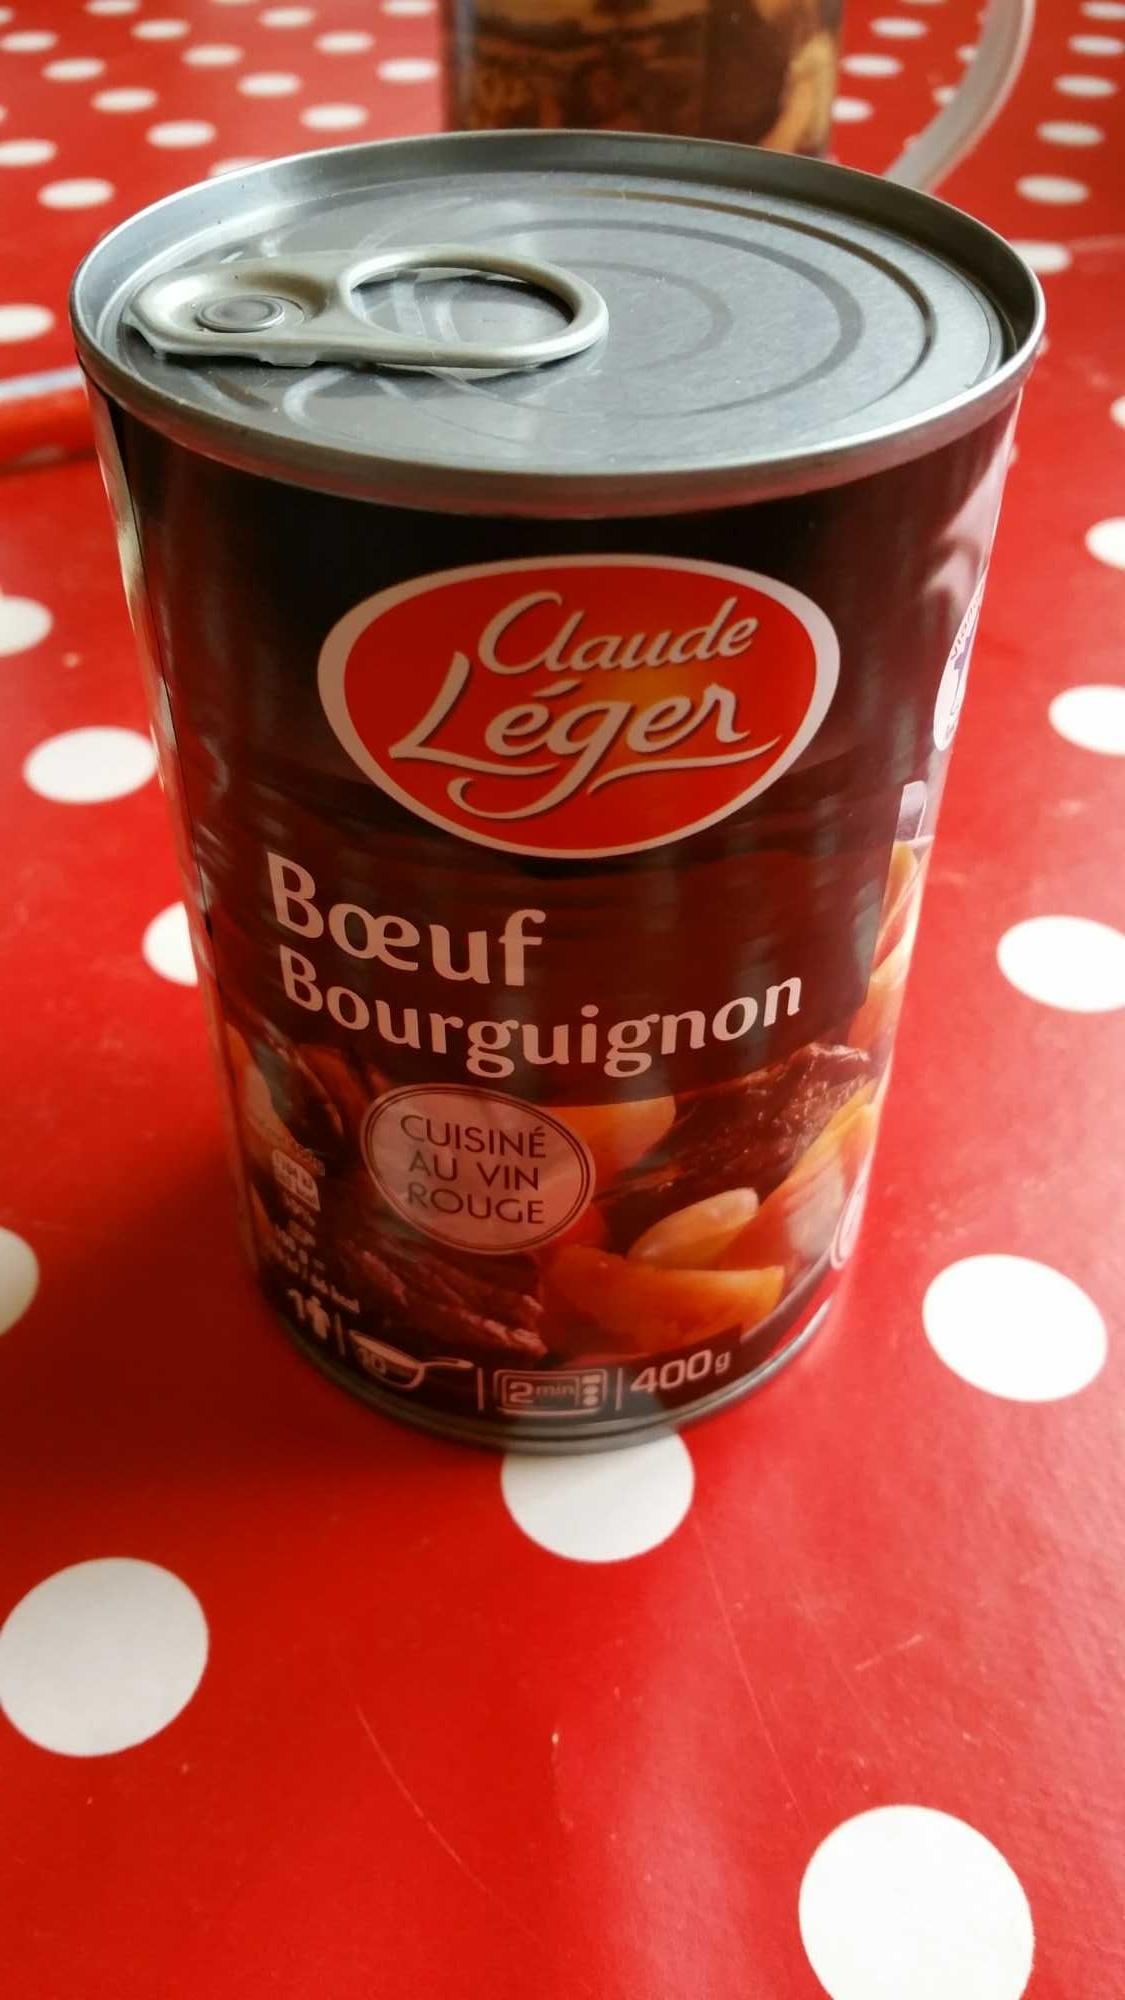 Boeuf Bourgignon  Au vin rouge - Product